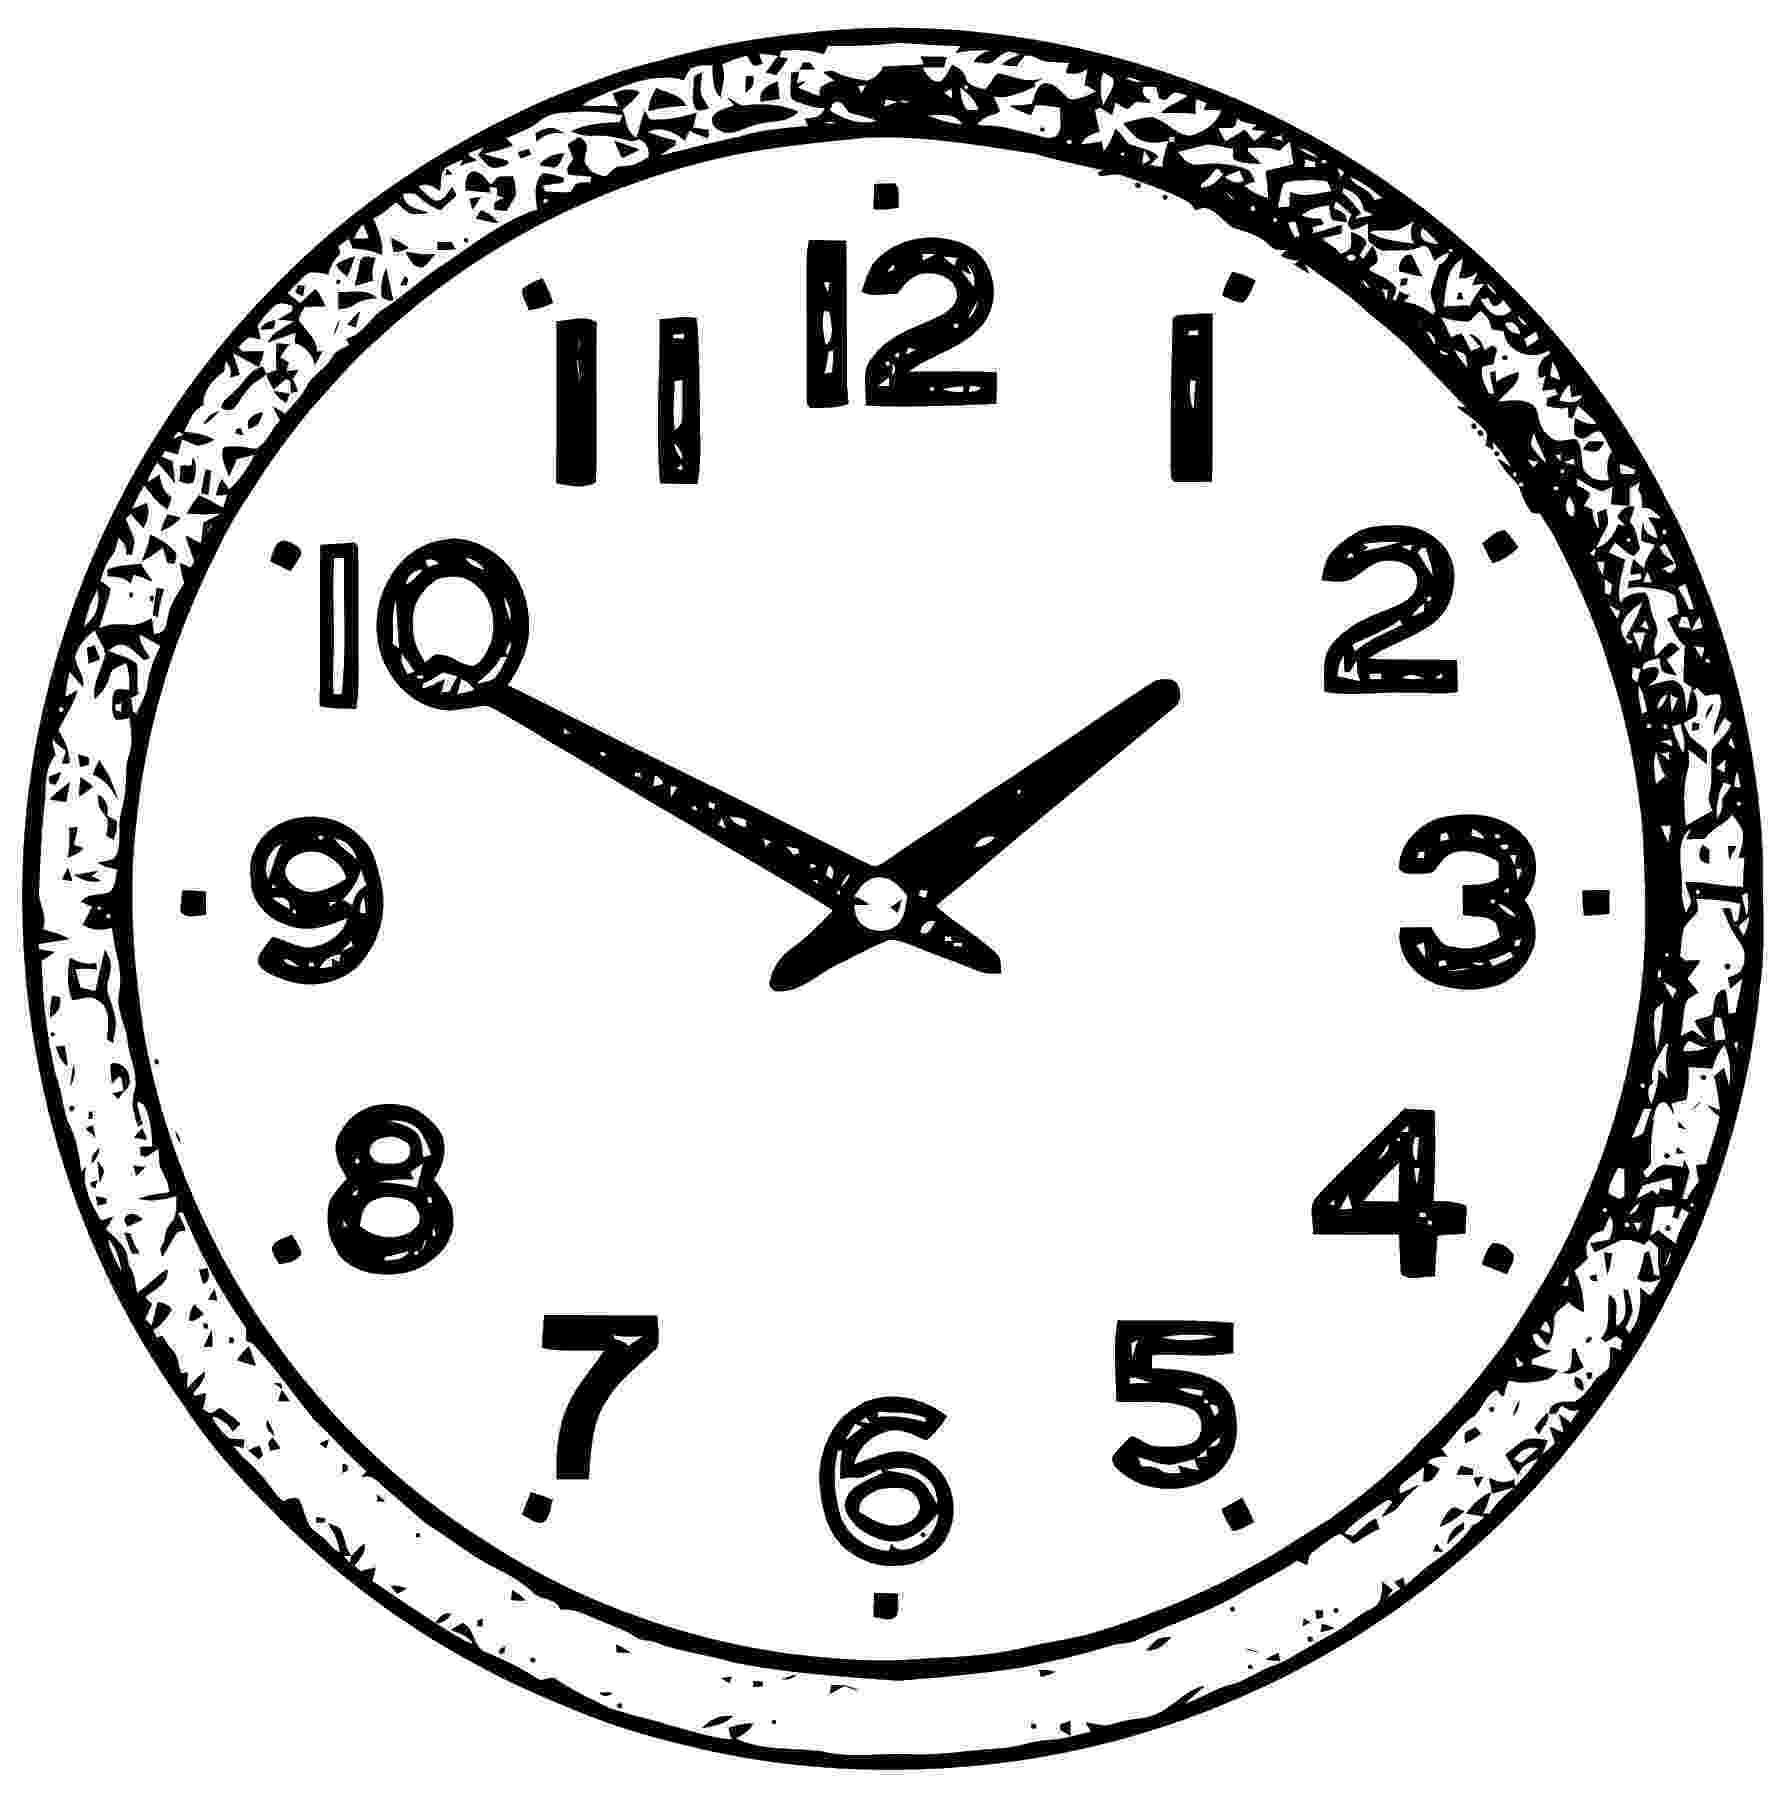 clock coloring page clock coloring pages 360coloringpages clock page coloring